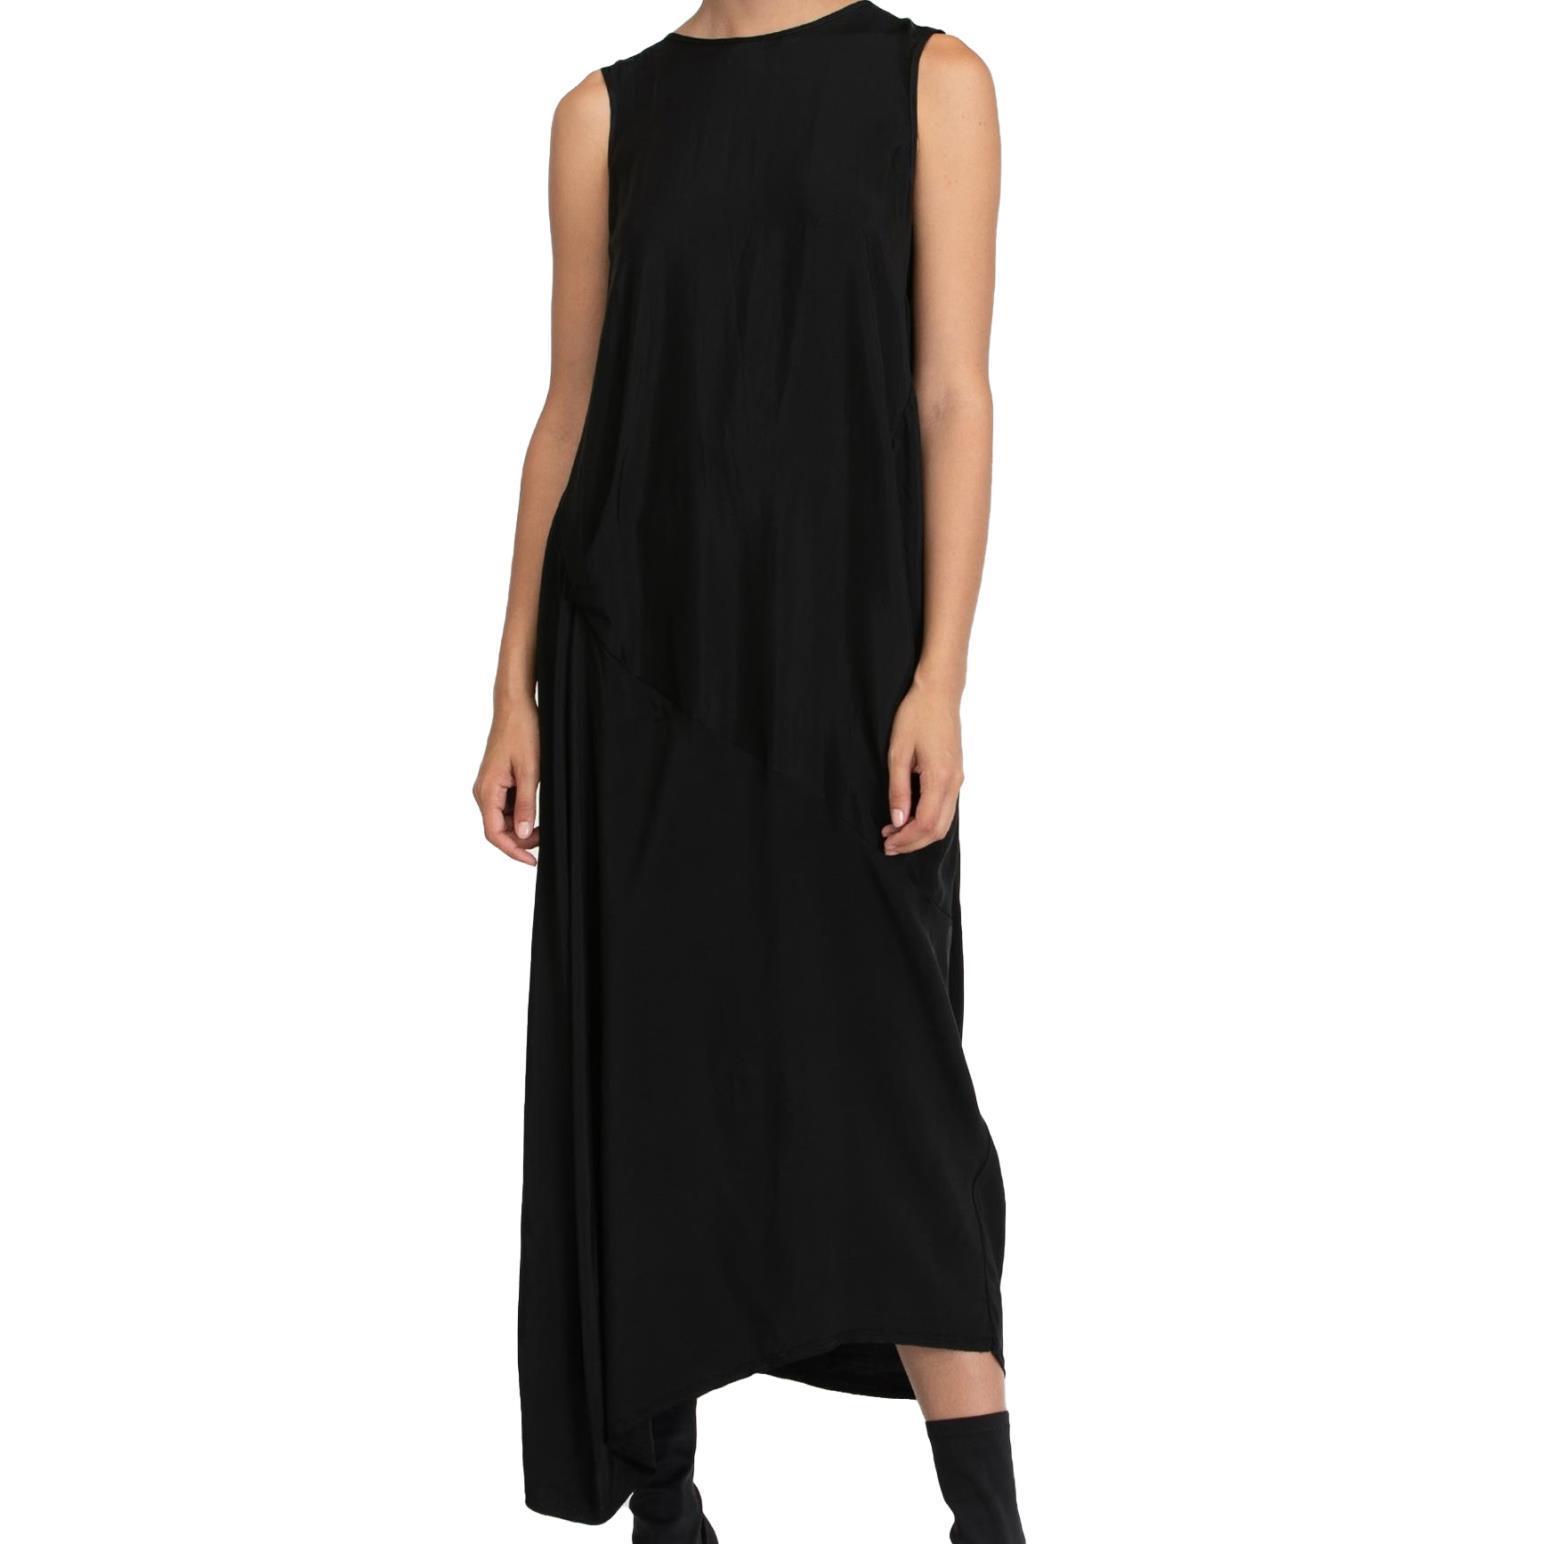 Taylor Surmise Dress